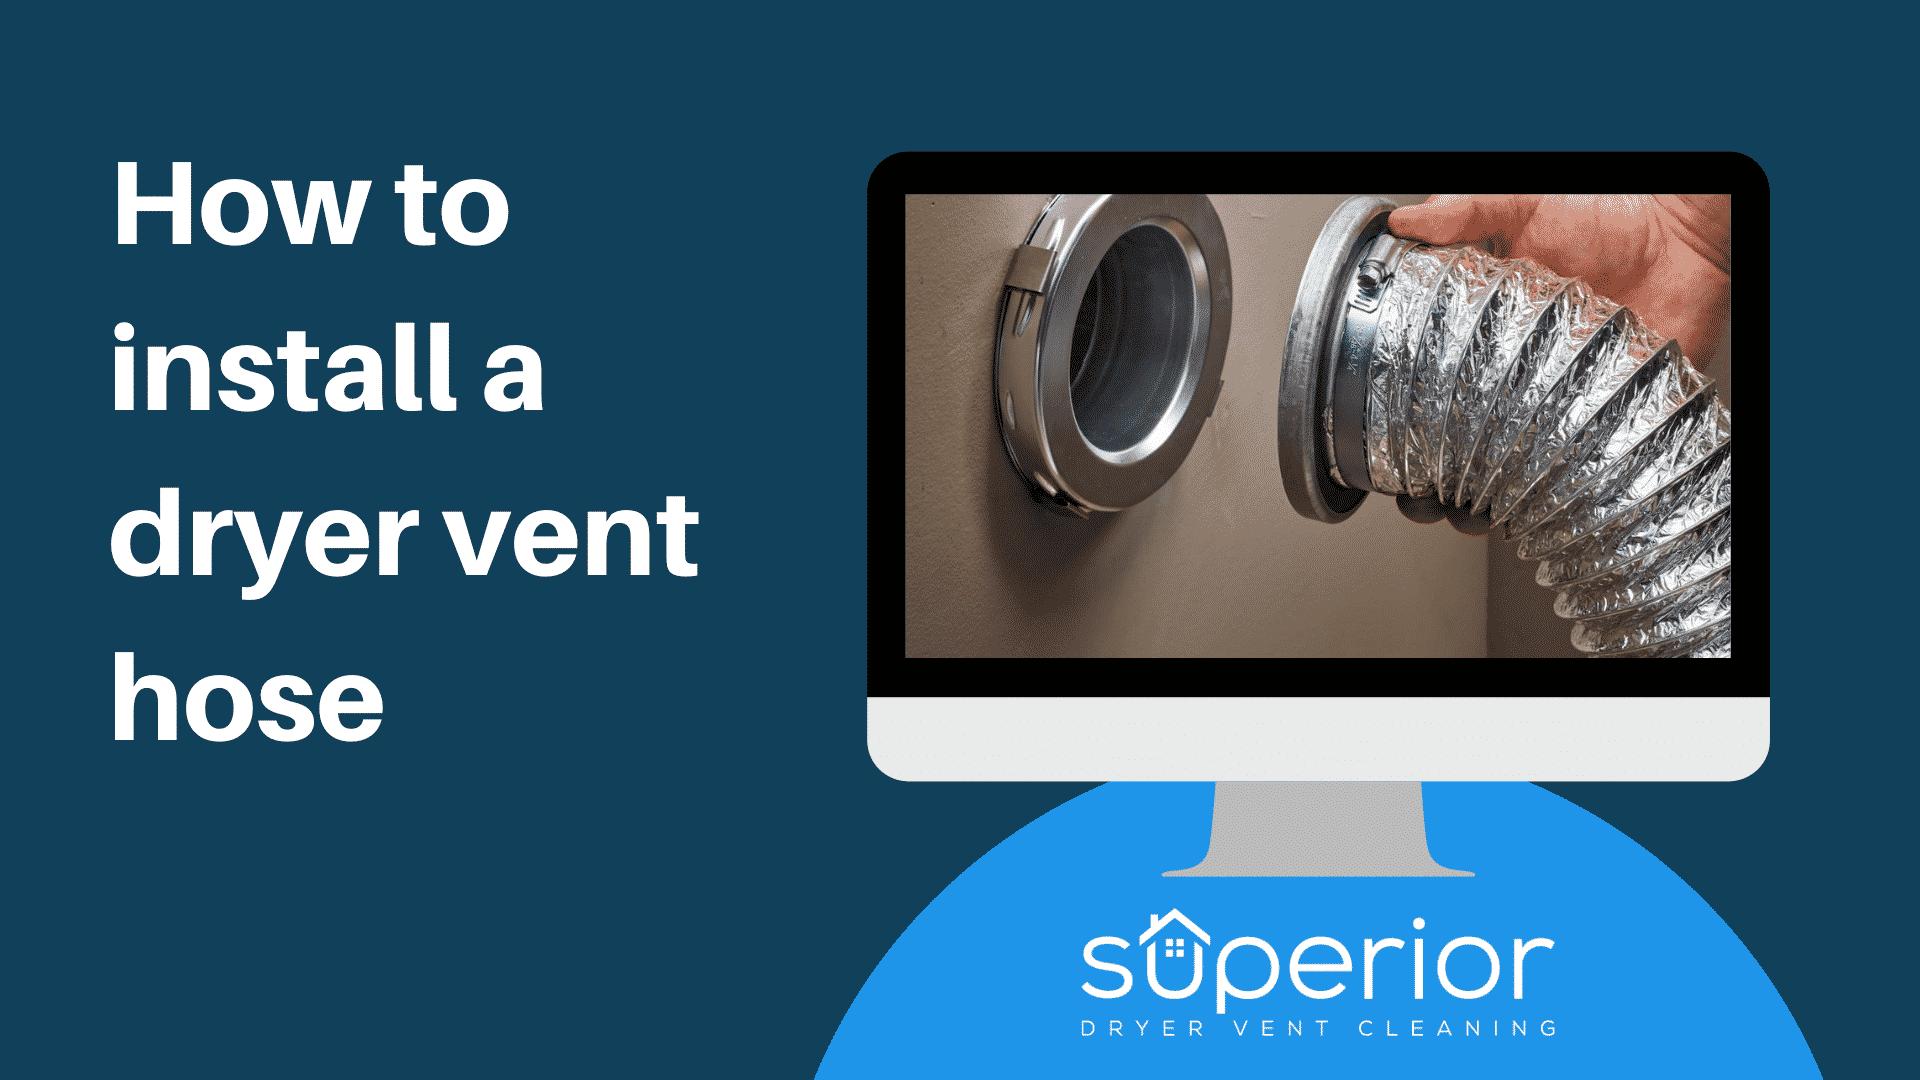 How to Install a Dryer Vent Hose